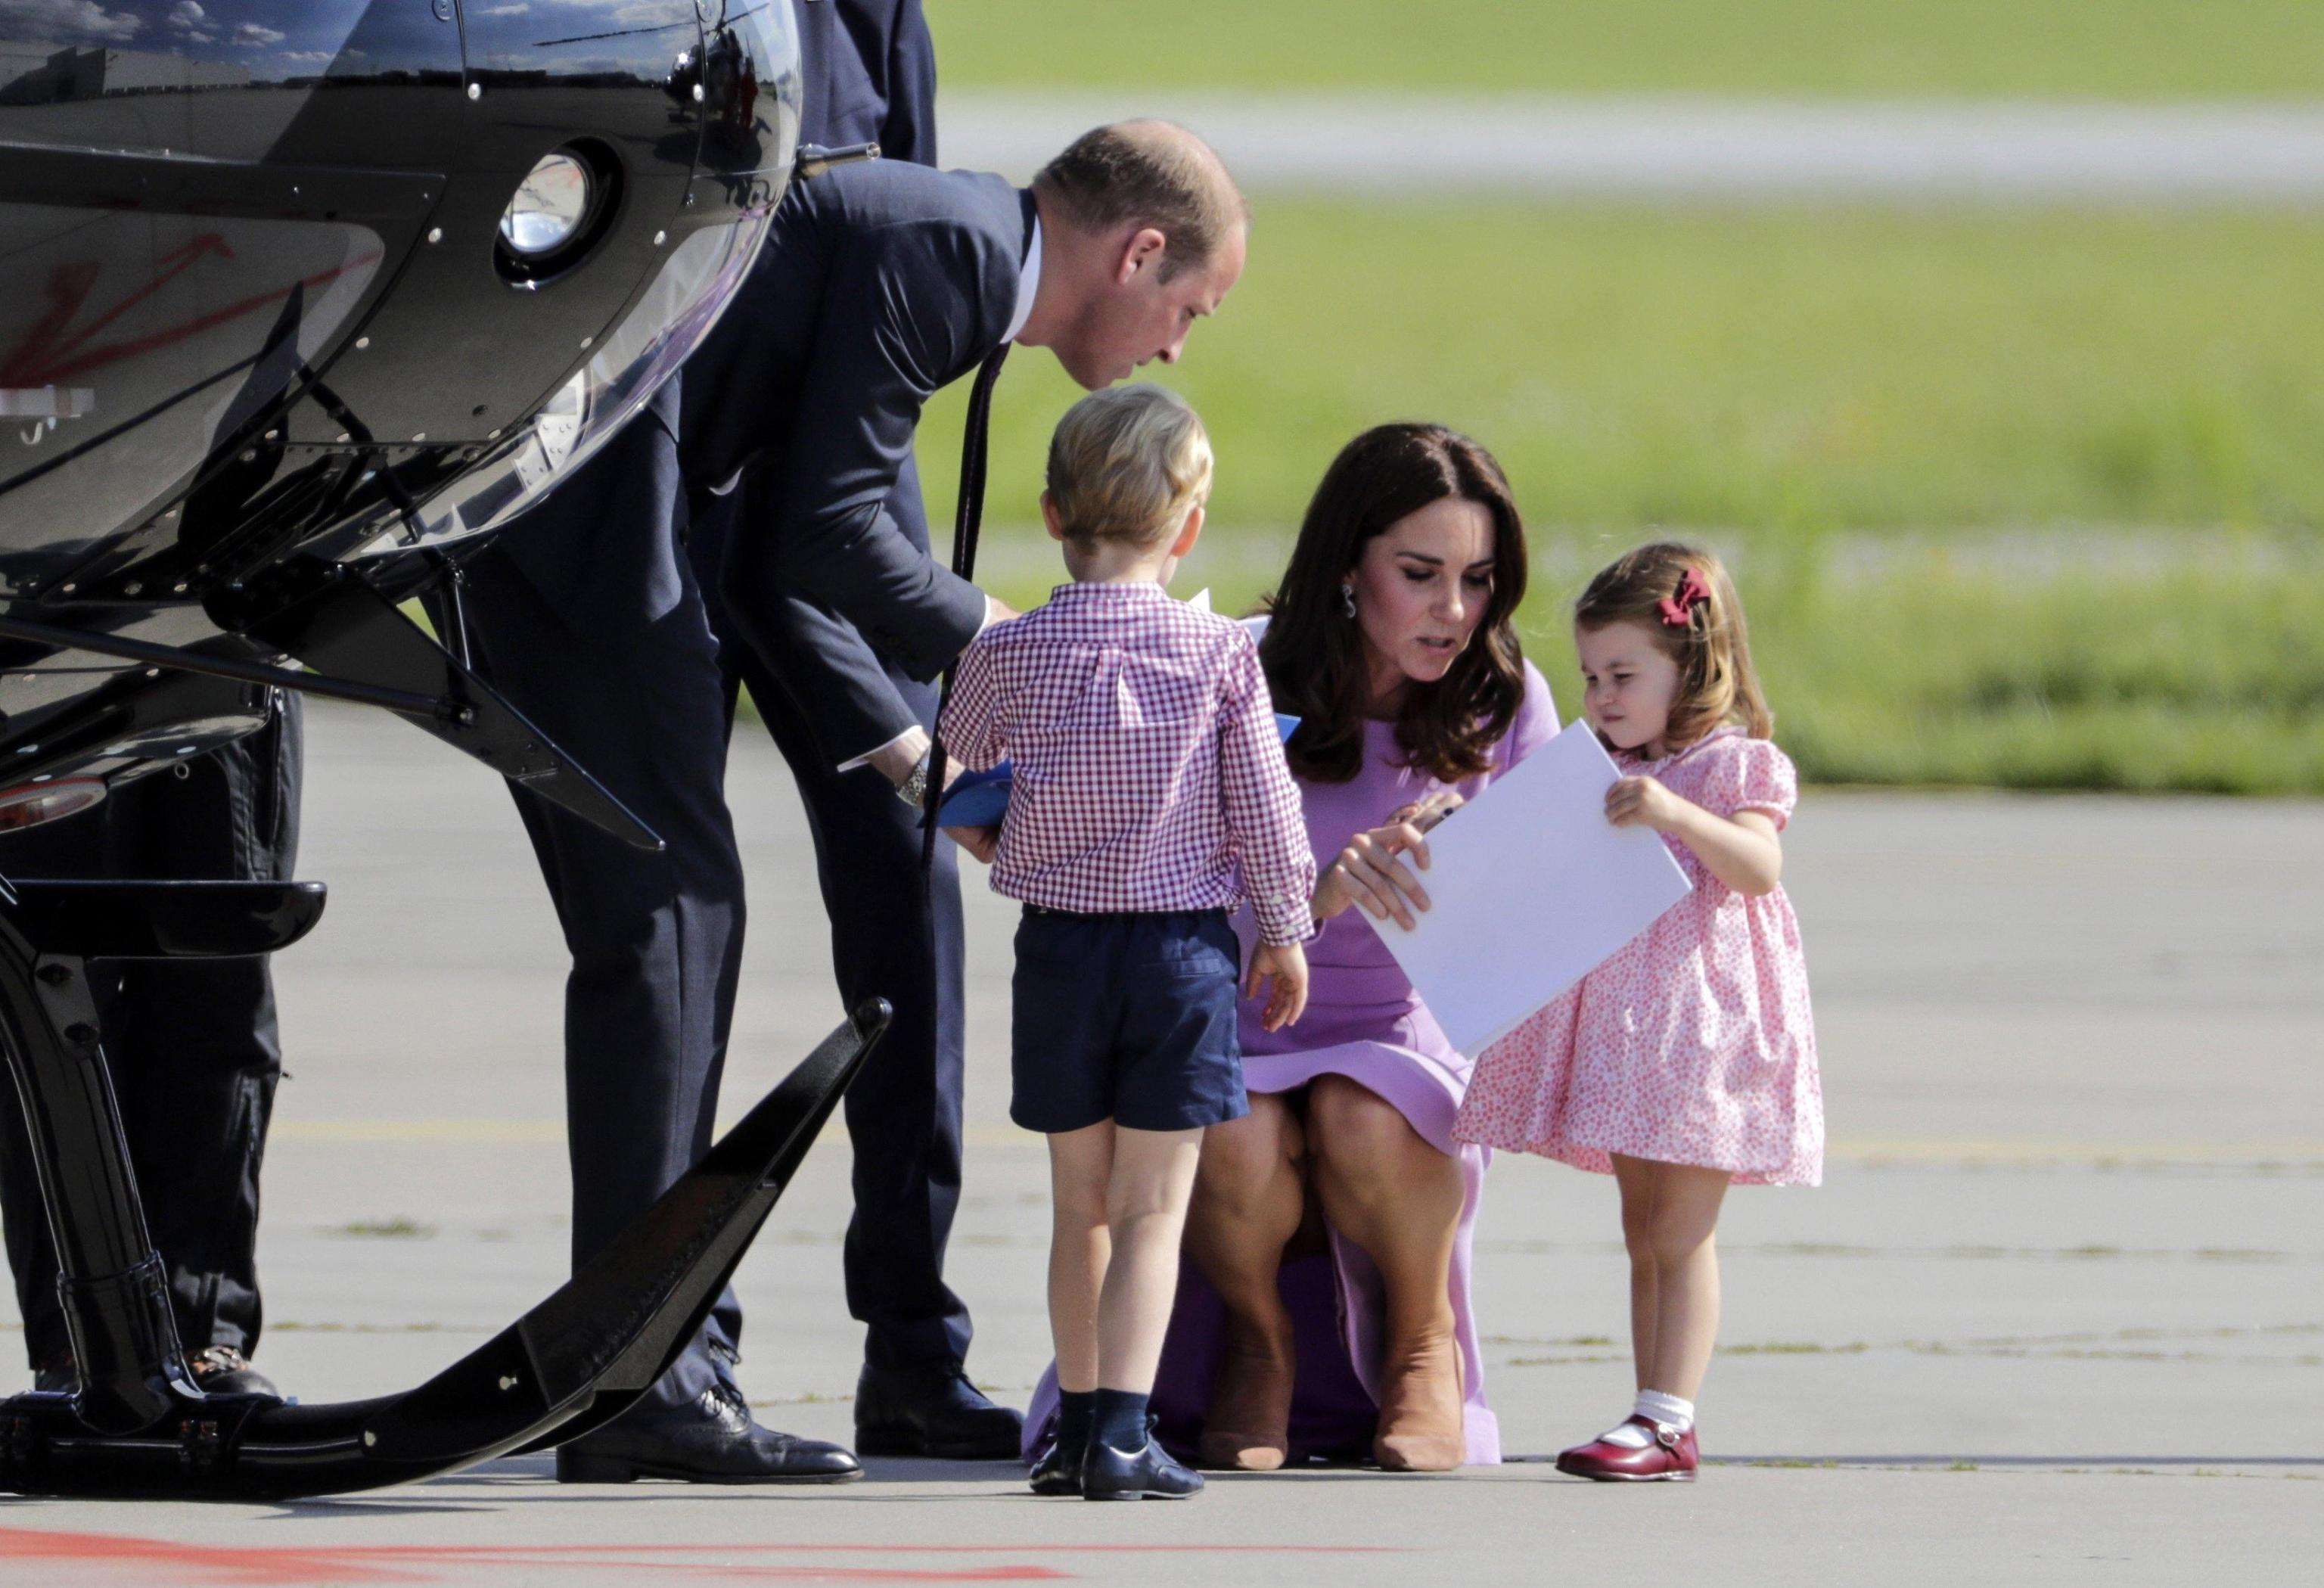 Duke and Duchess of Cambridge visit Germany